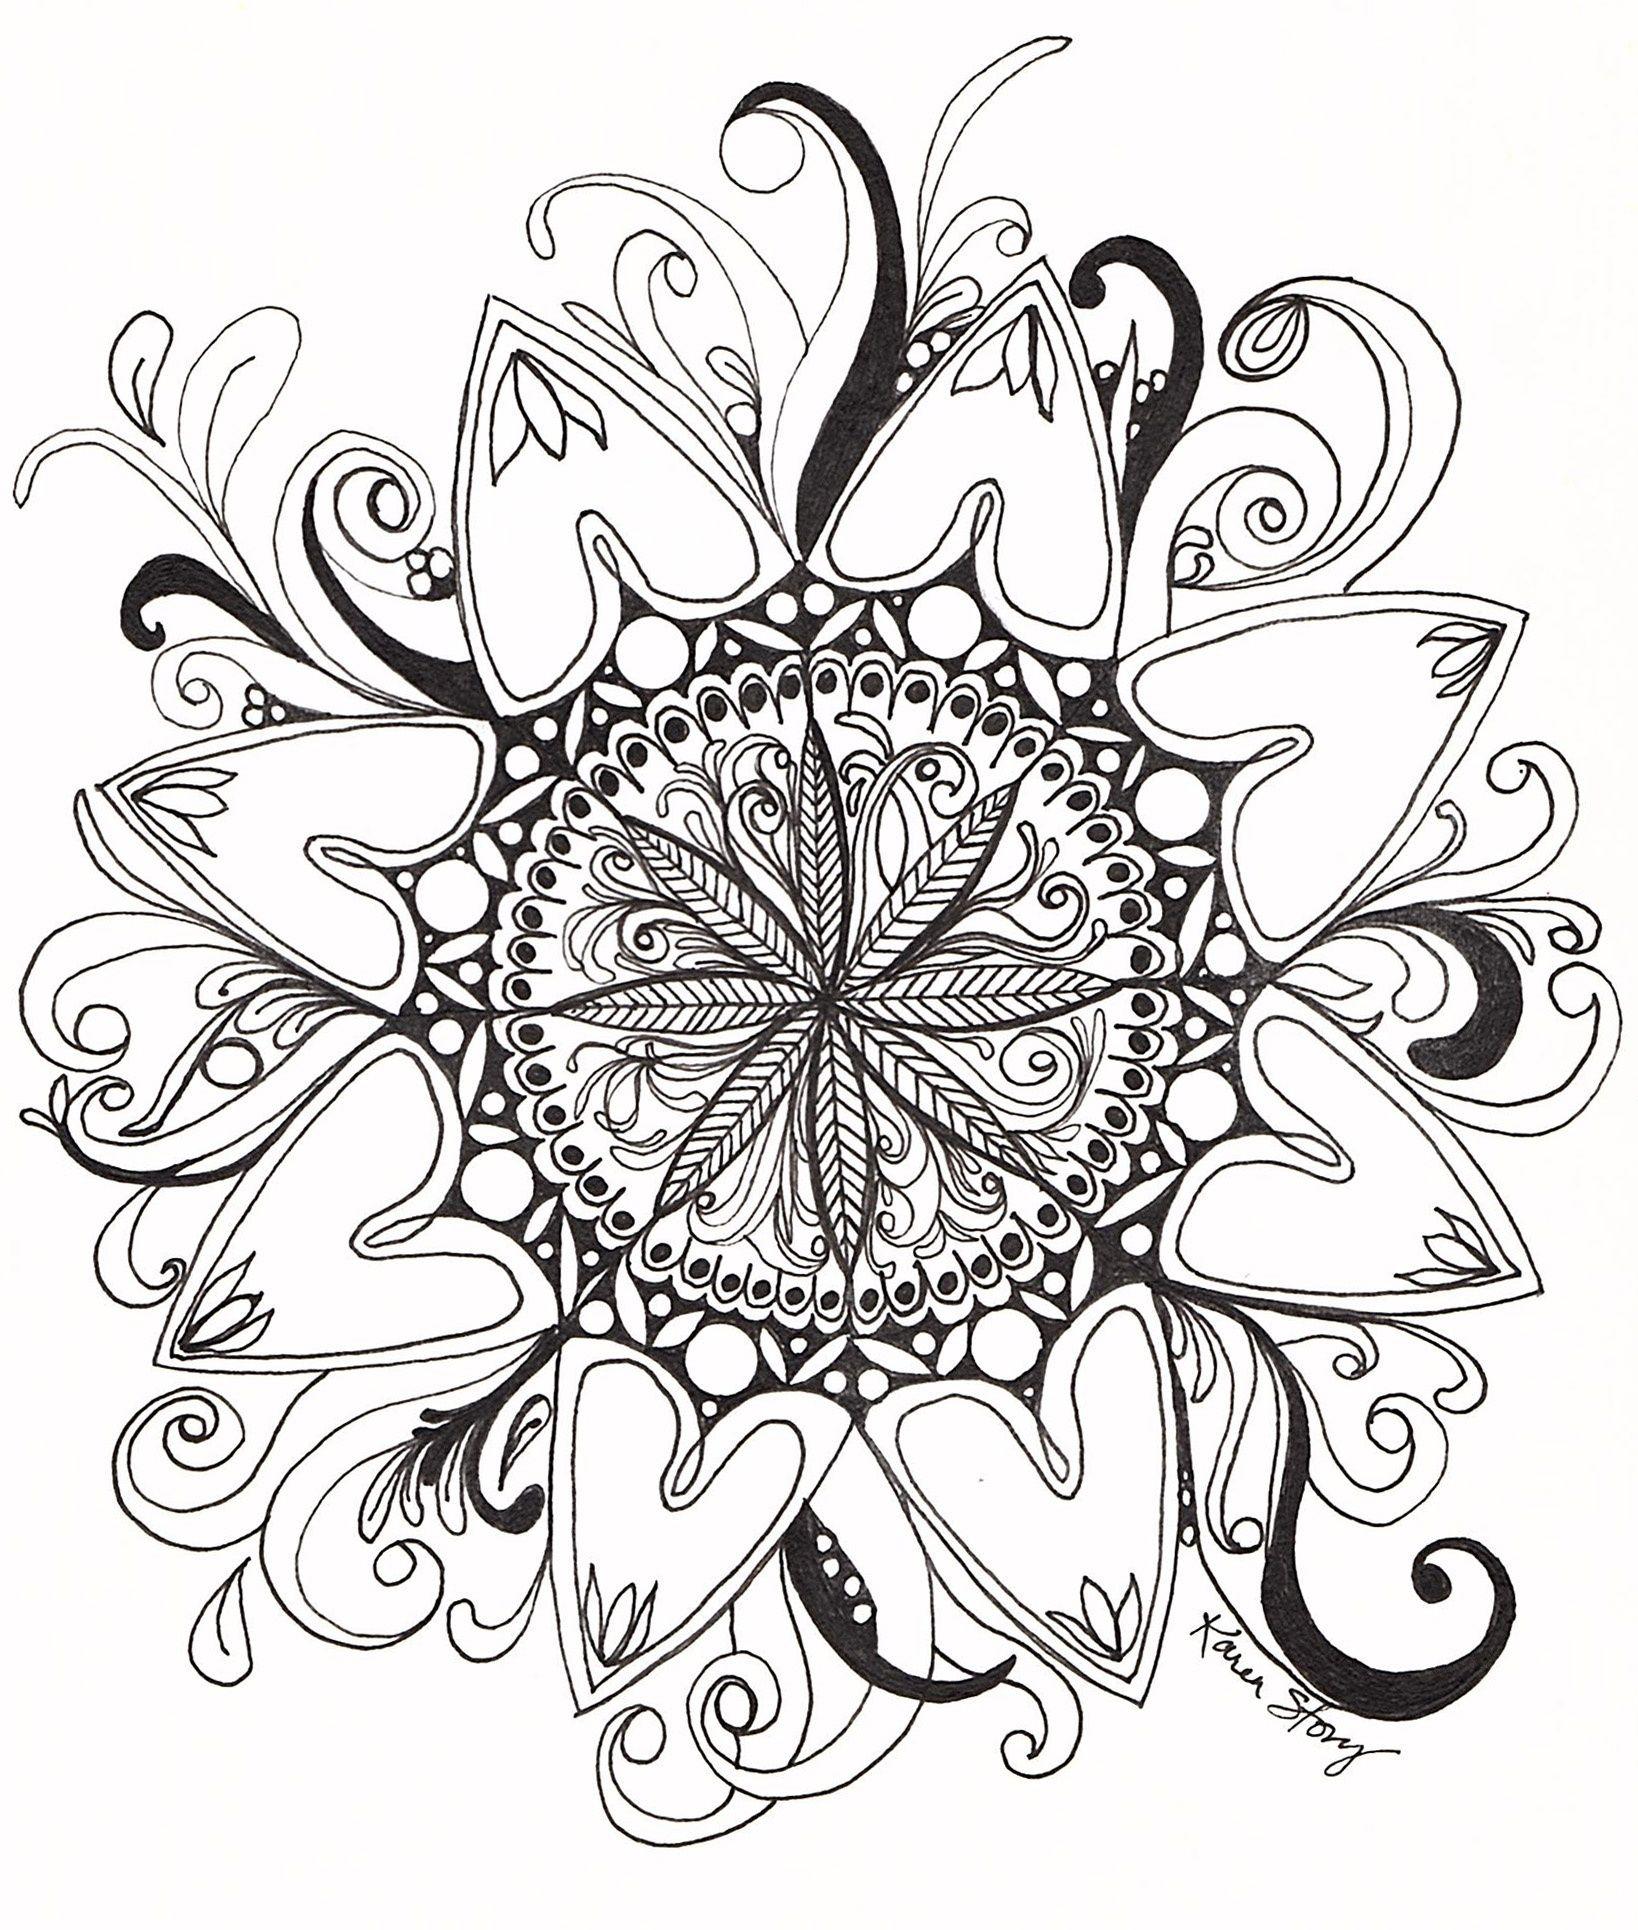 Swirl Mandala Coloring Page Mandala Coloring Pages Mandala Coloring Coloring Pages